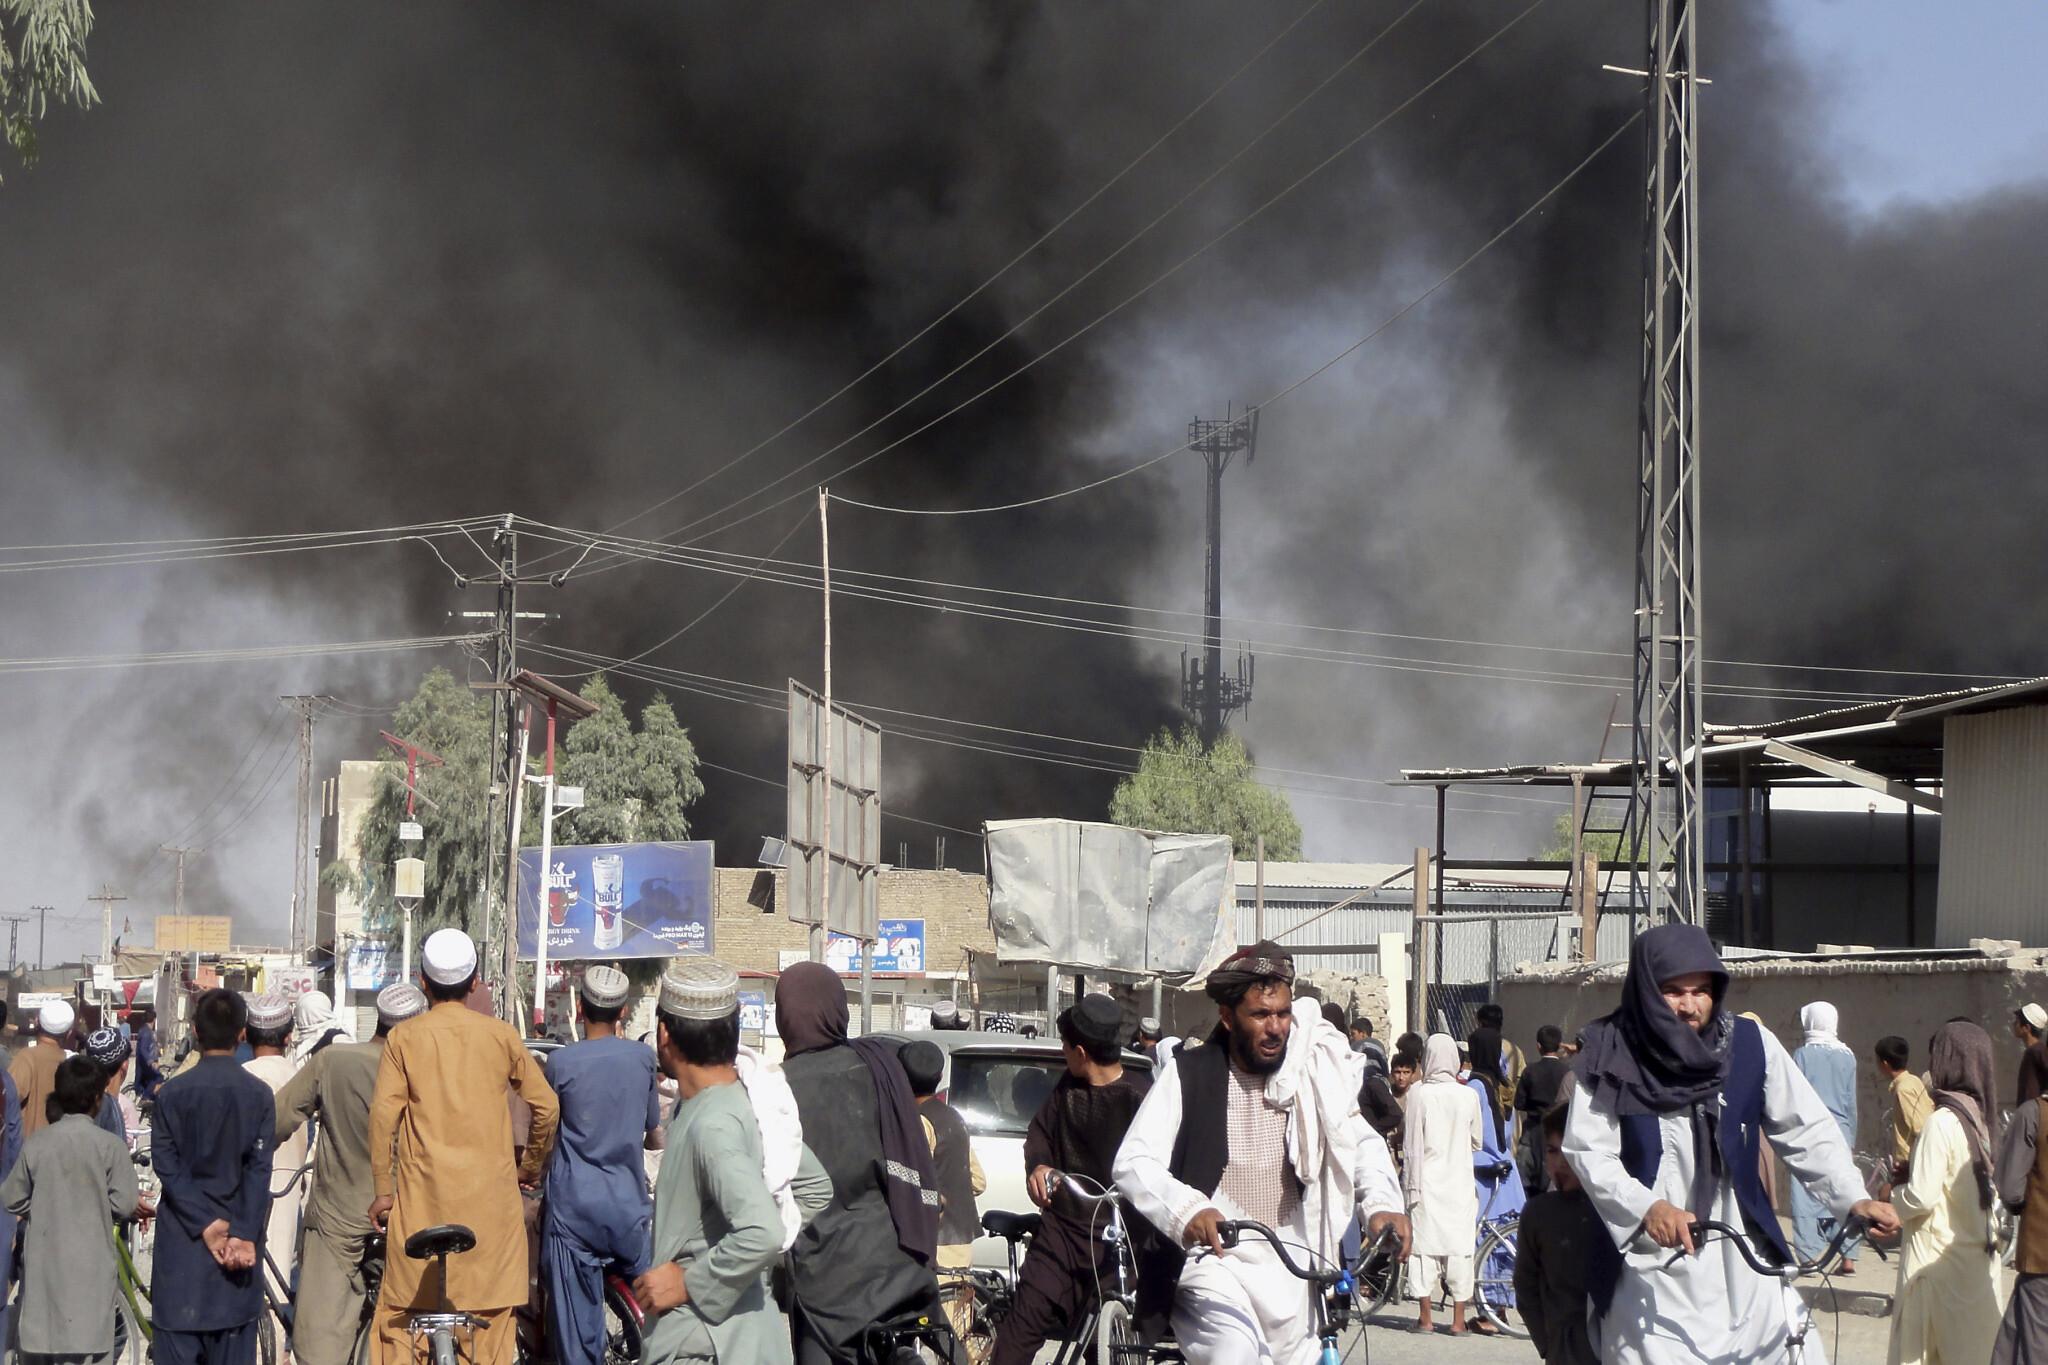 Taliban near gates of Kabul as embassies prepare for evacuations